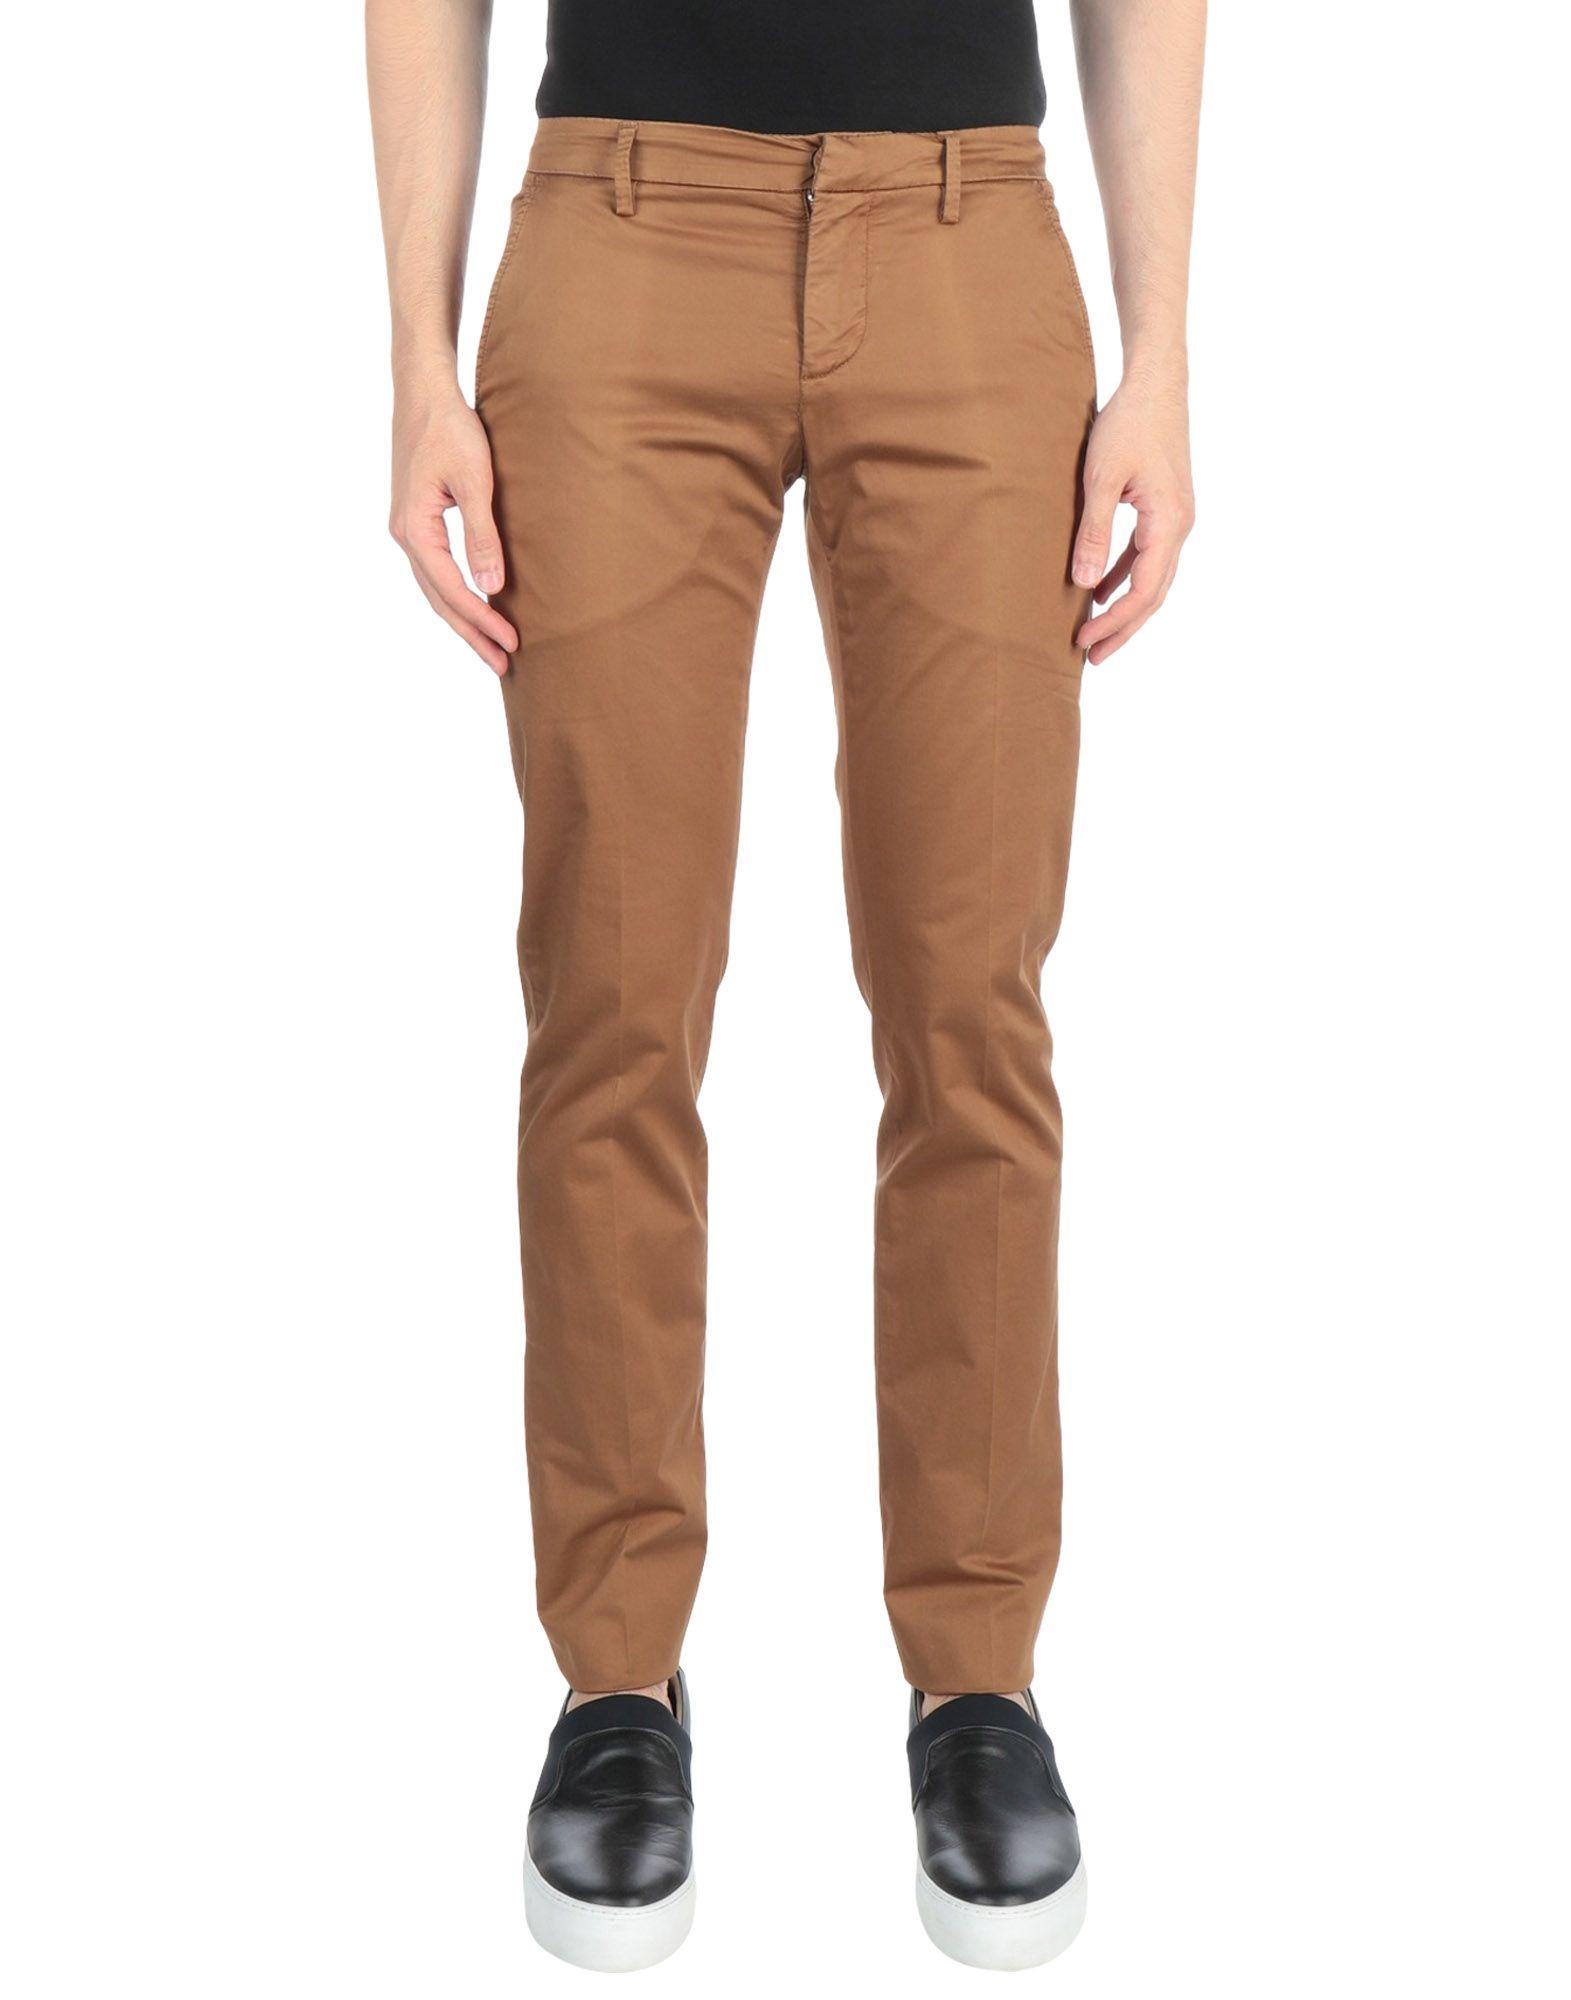 DONDUP Повседневные брюки антарктические повседневные брюки деловые мужские хлопок прямые повседневные брюки m006 cangqing 40